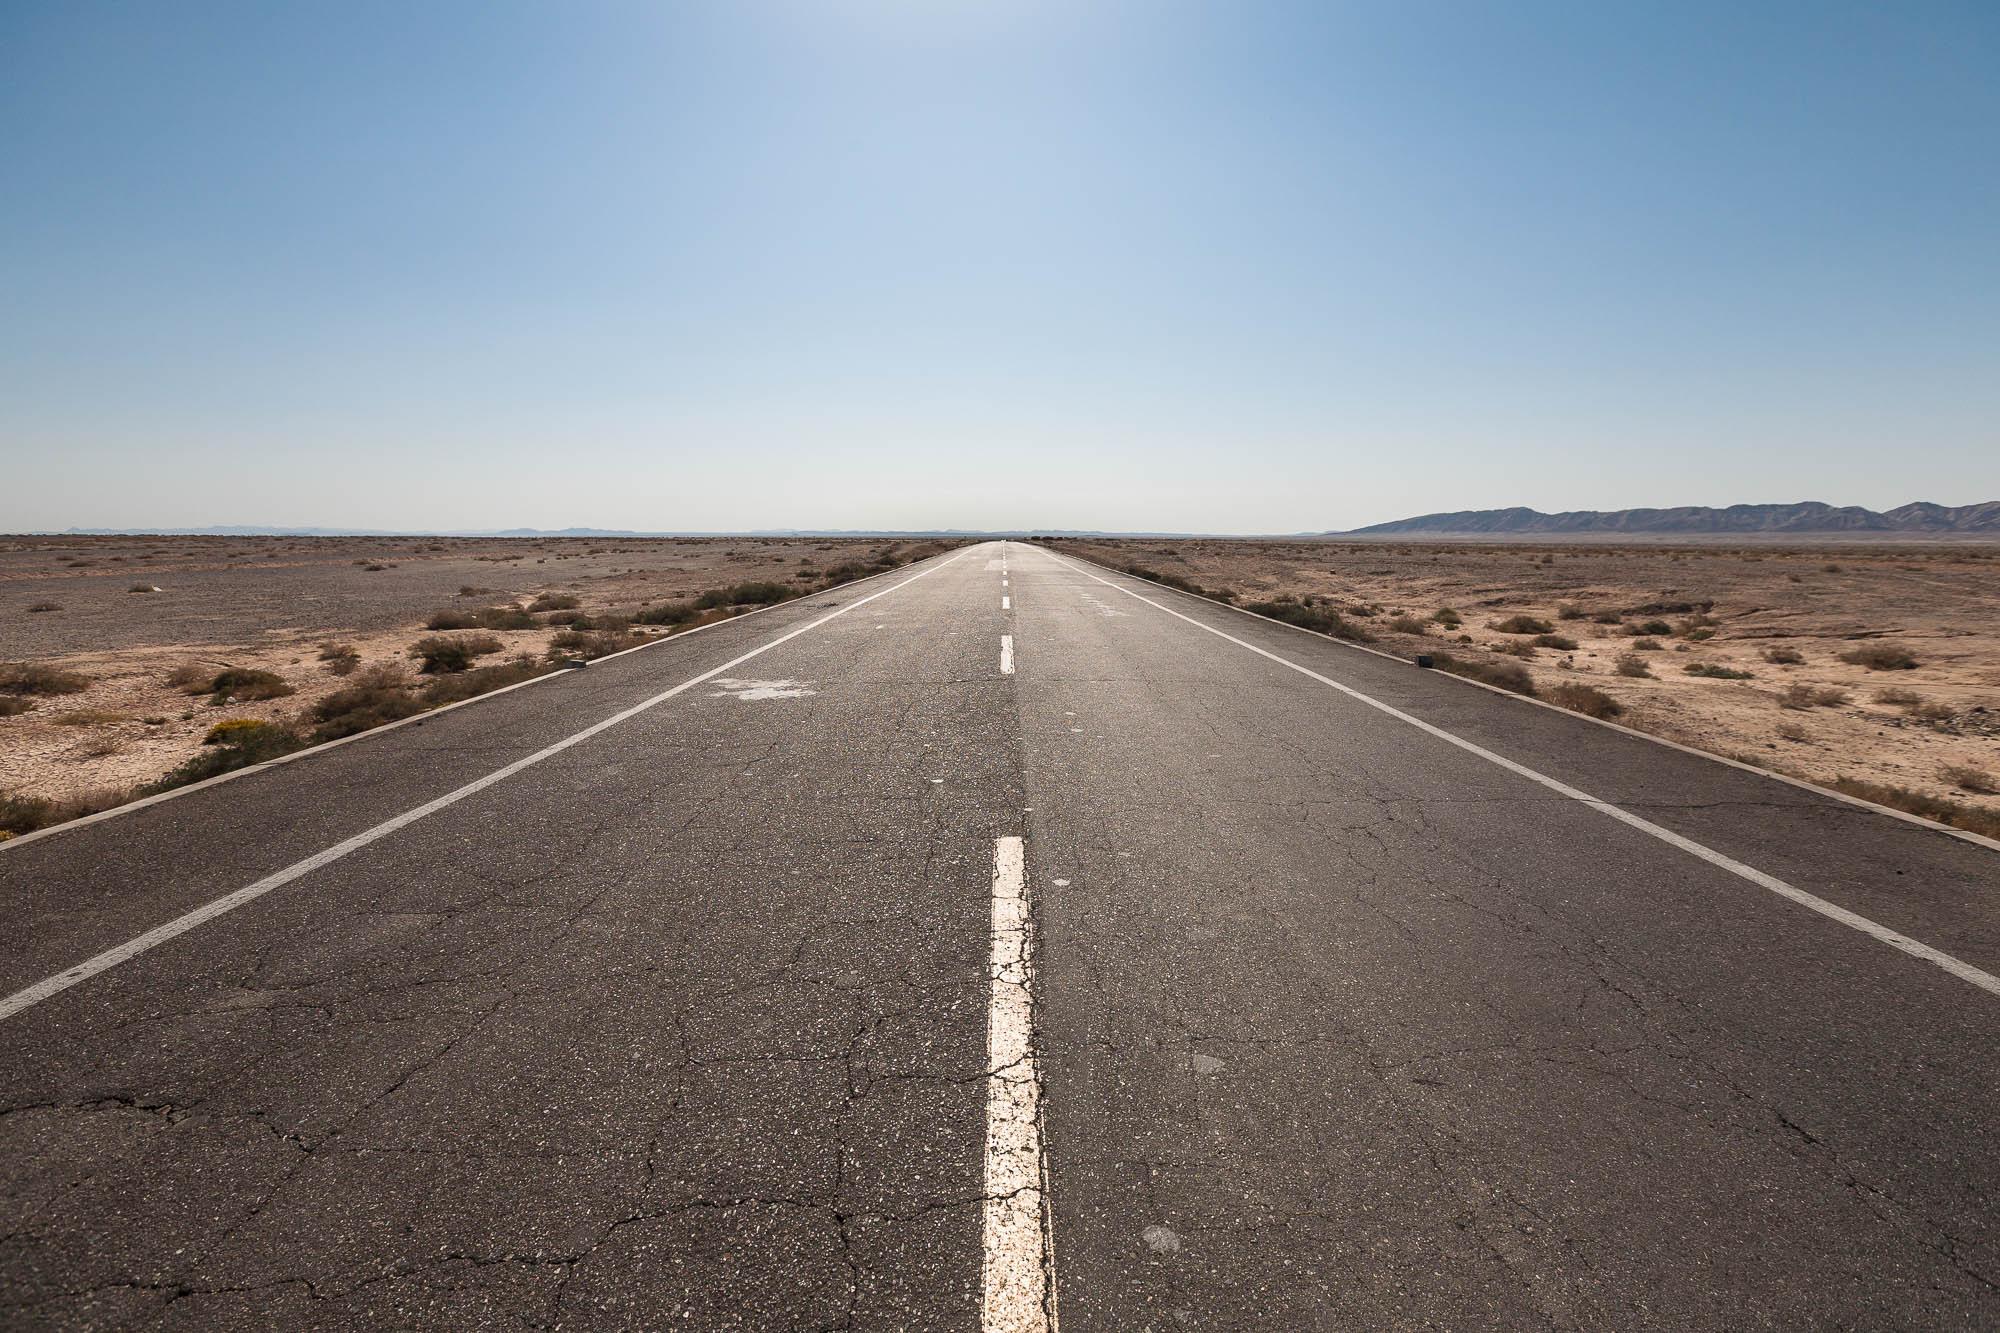 desert road in the Gobi